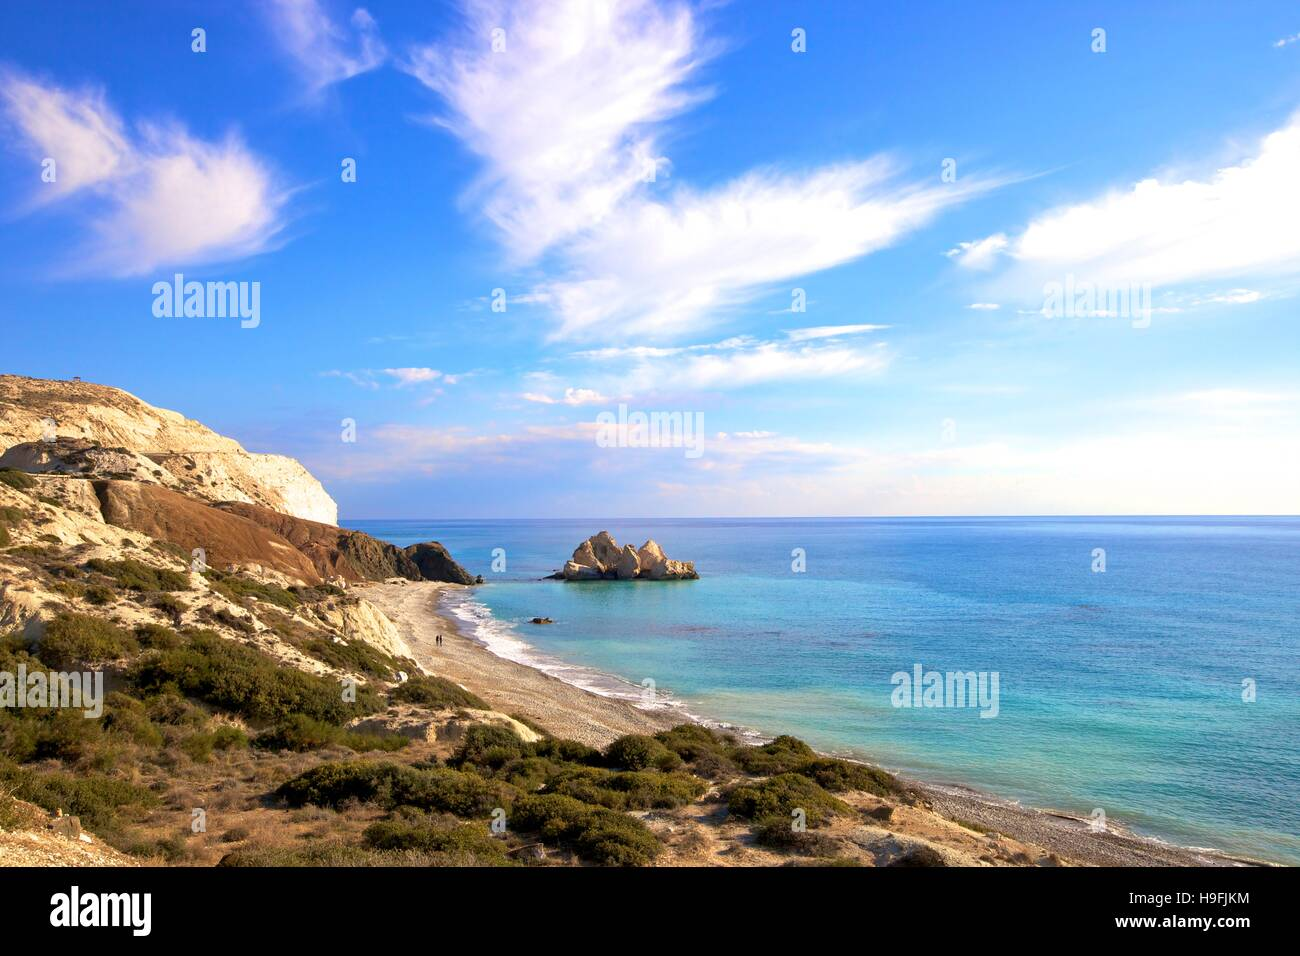 Saracen Rock, Paphos, Cyprus, Eastern Mediterranean Sea - Stock Image